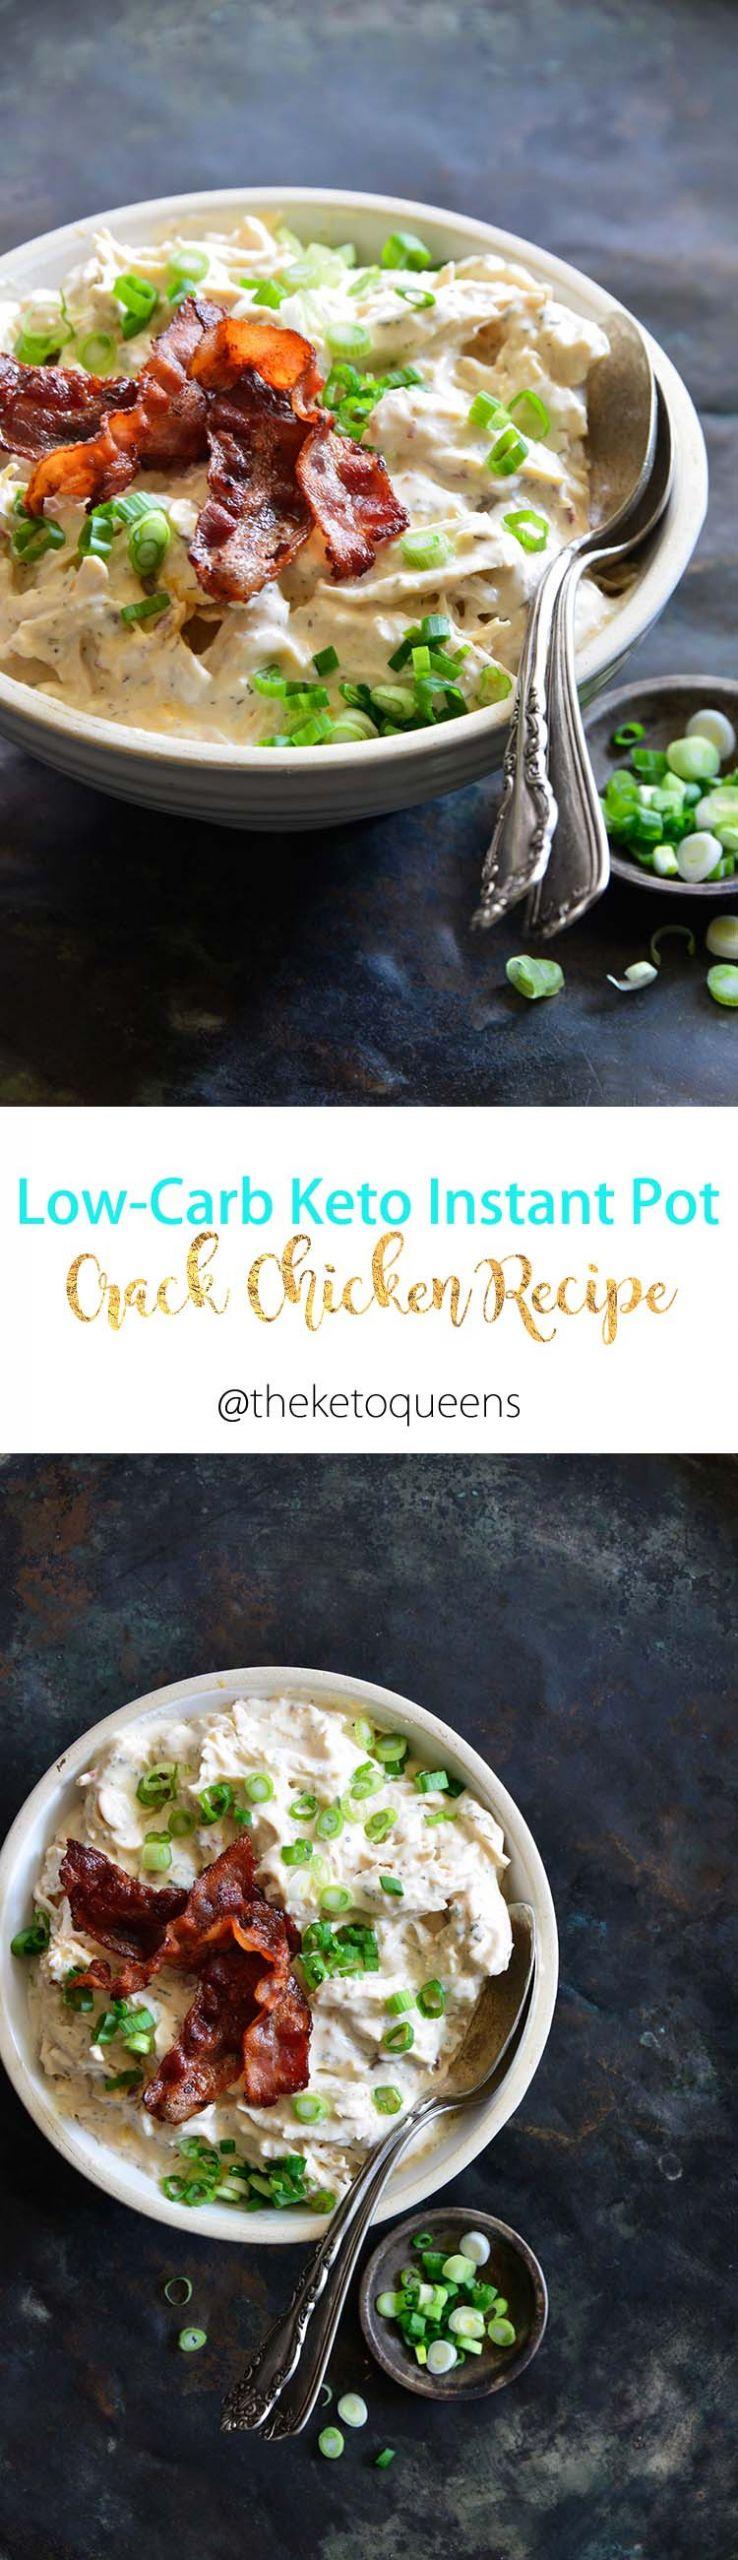 Instant Pot Keto Chicken  Easy Keto Low Carb Instant Pot Crack Chicken Recipe